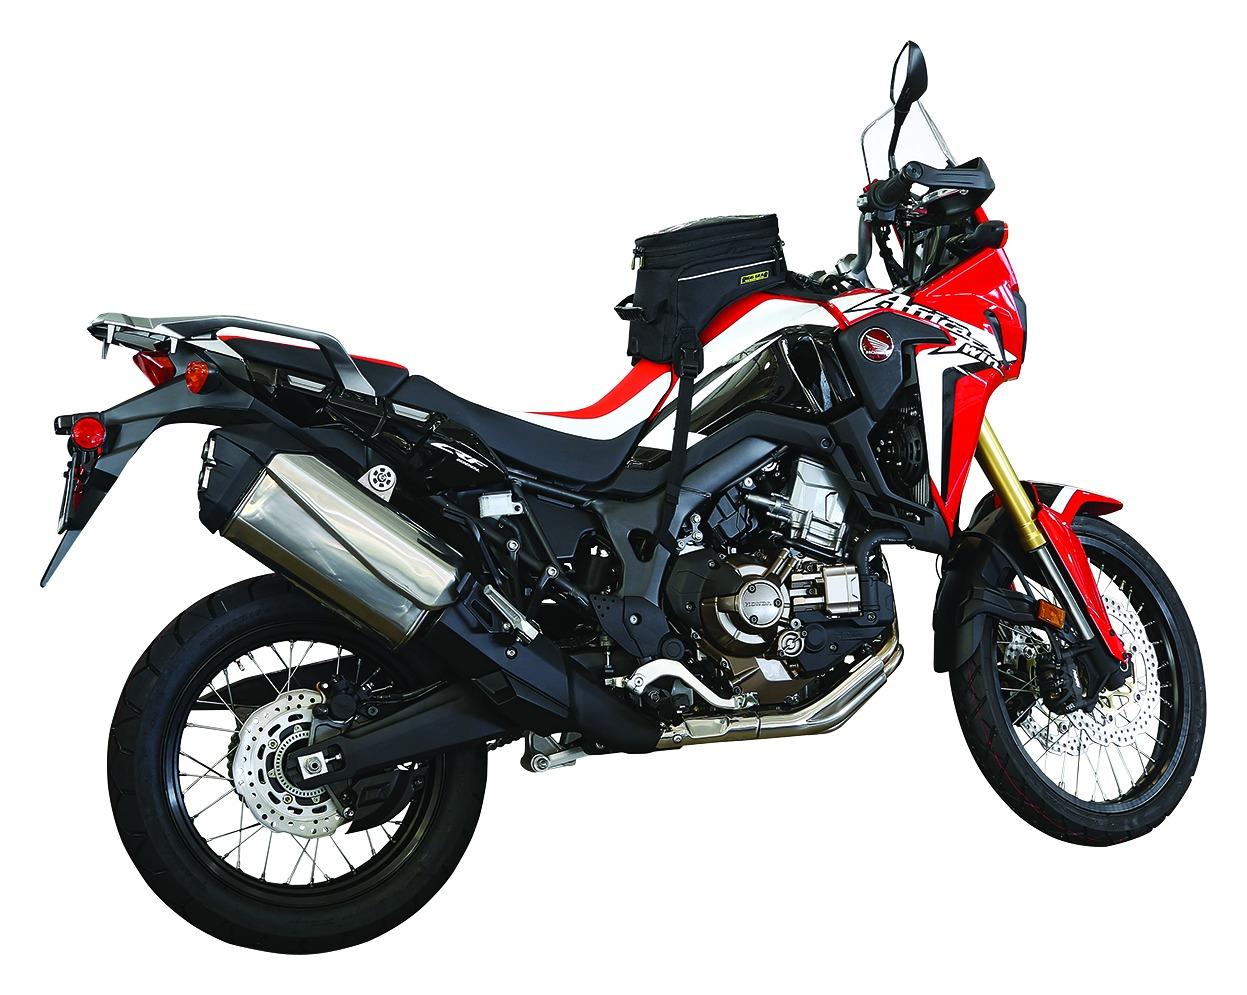 Honda CRF250 CRF250R CRF250X 2007 2008 2009 2010 Black Chain Guide RHK-CG-01K